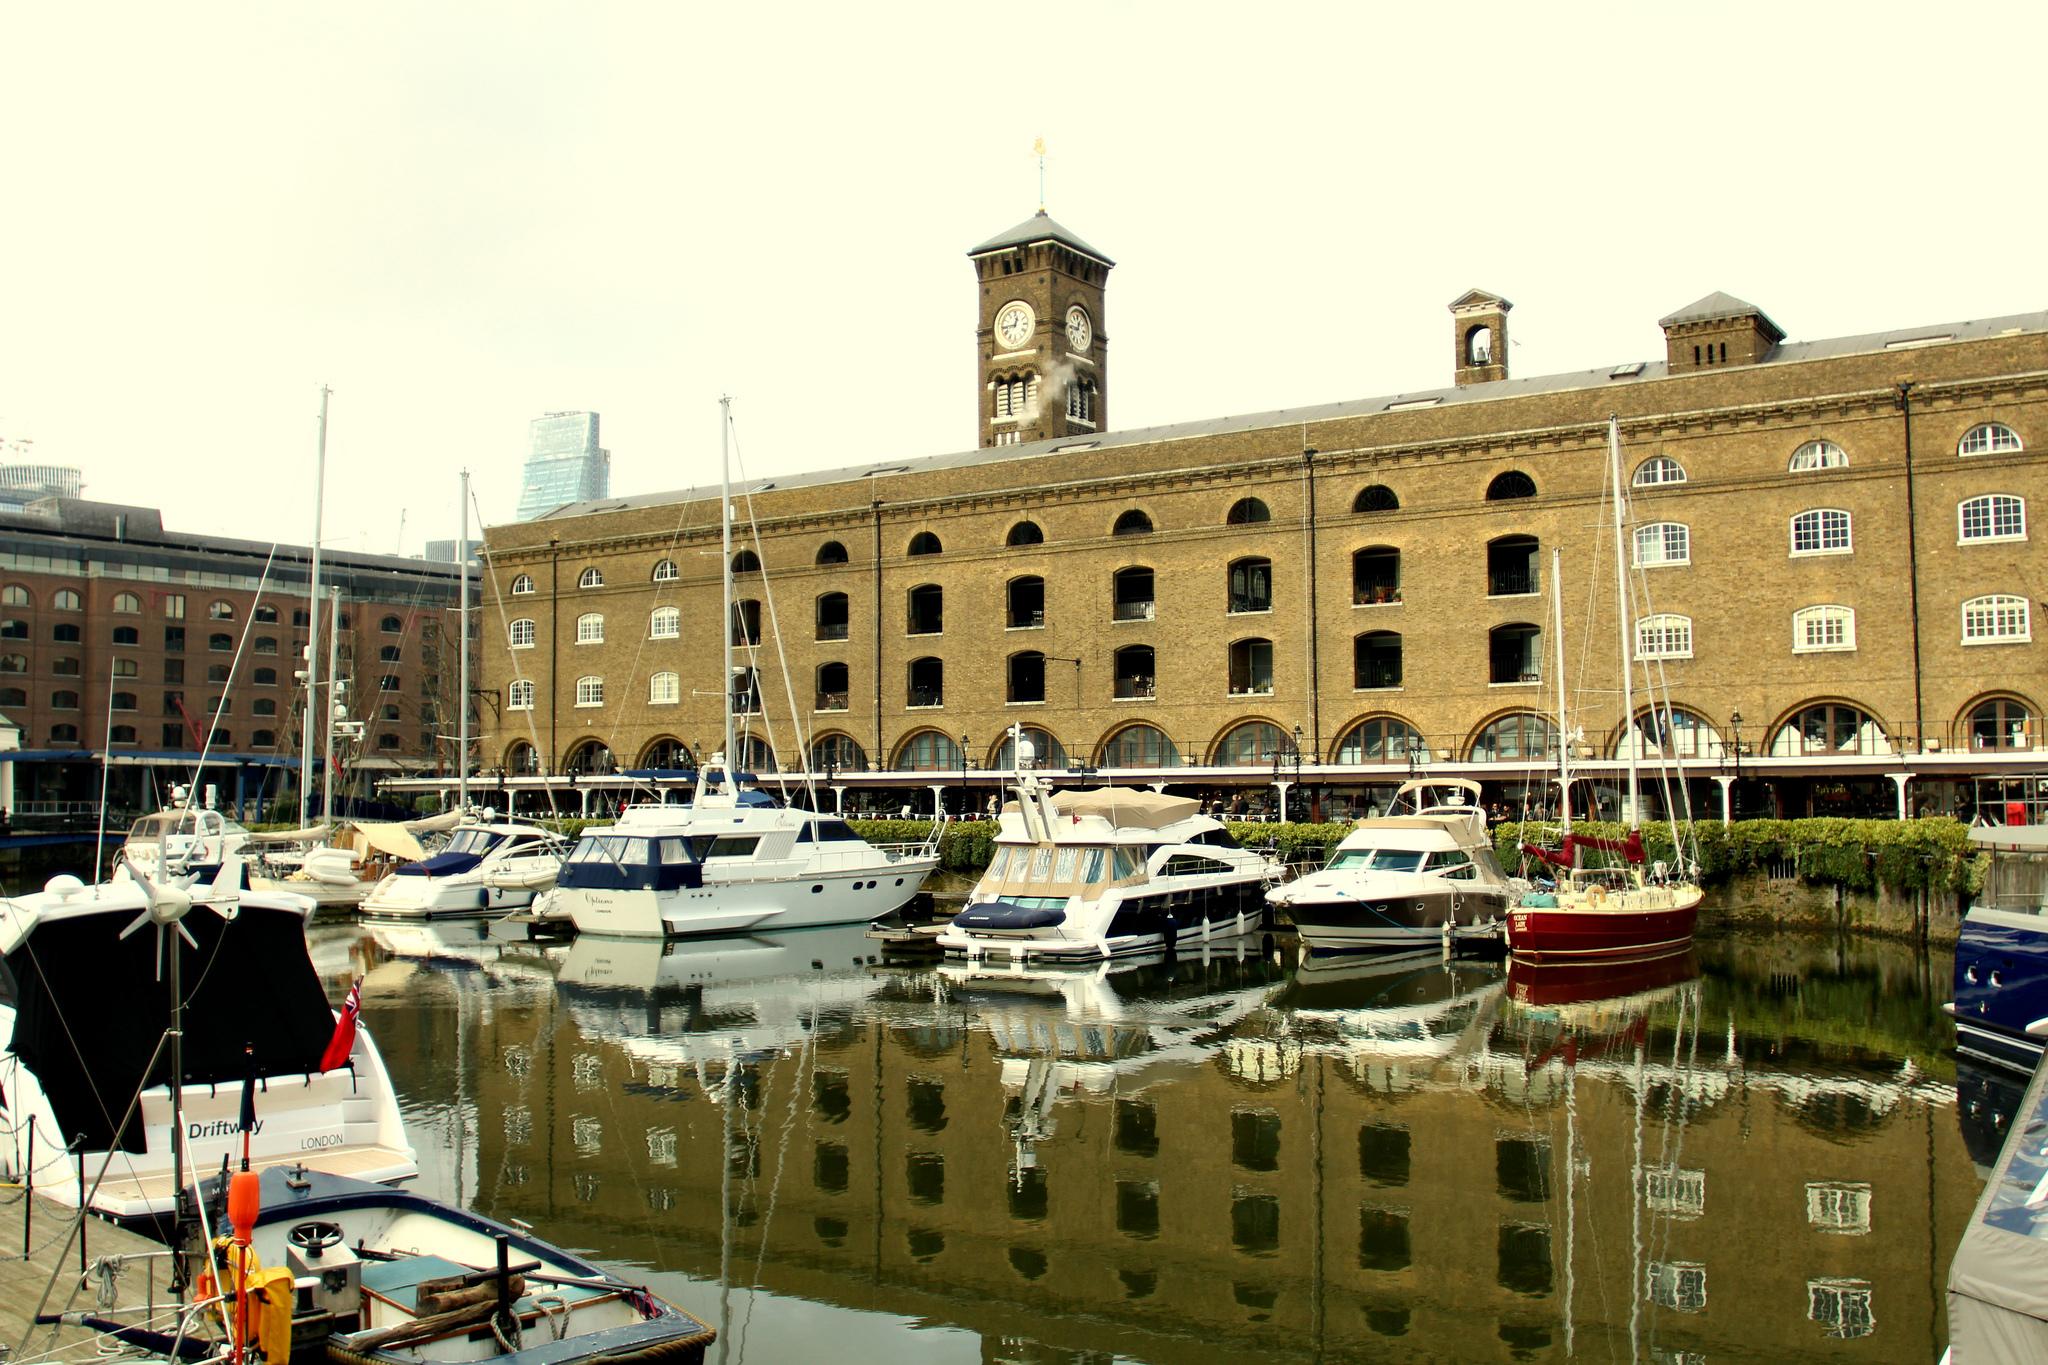 St Katherine's Dock | © Bex Walton / flickr